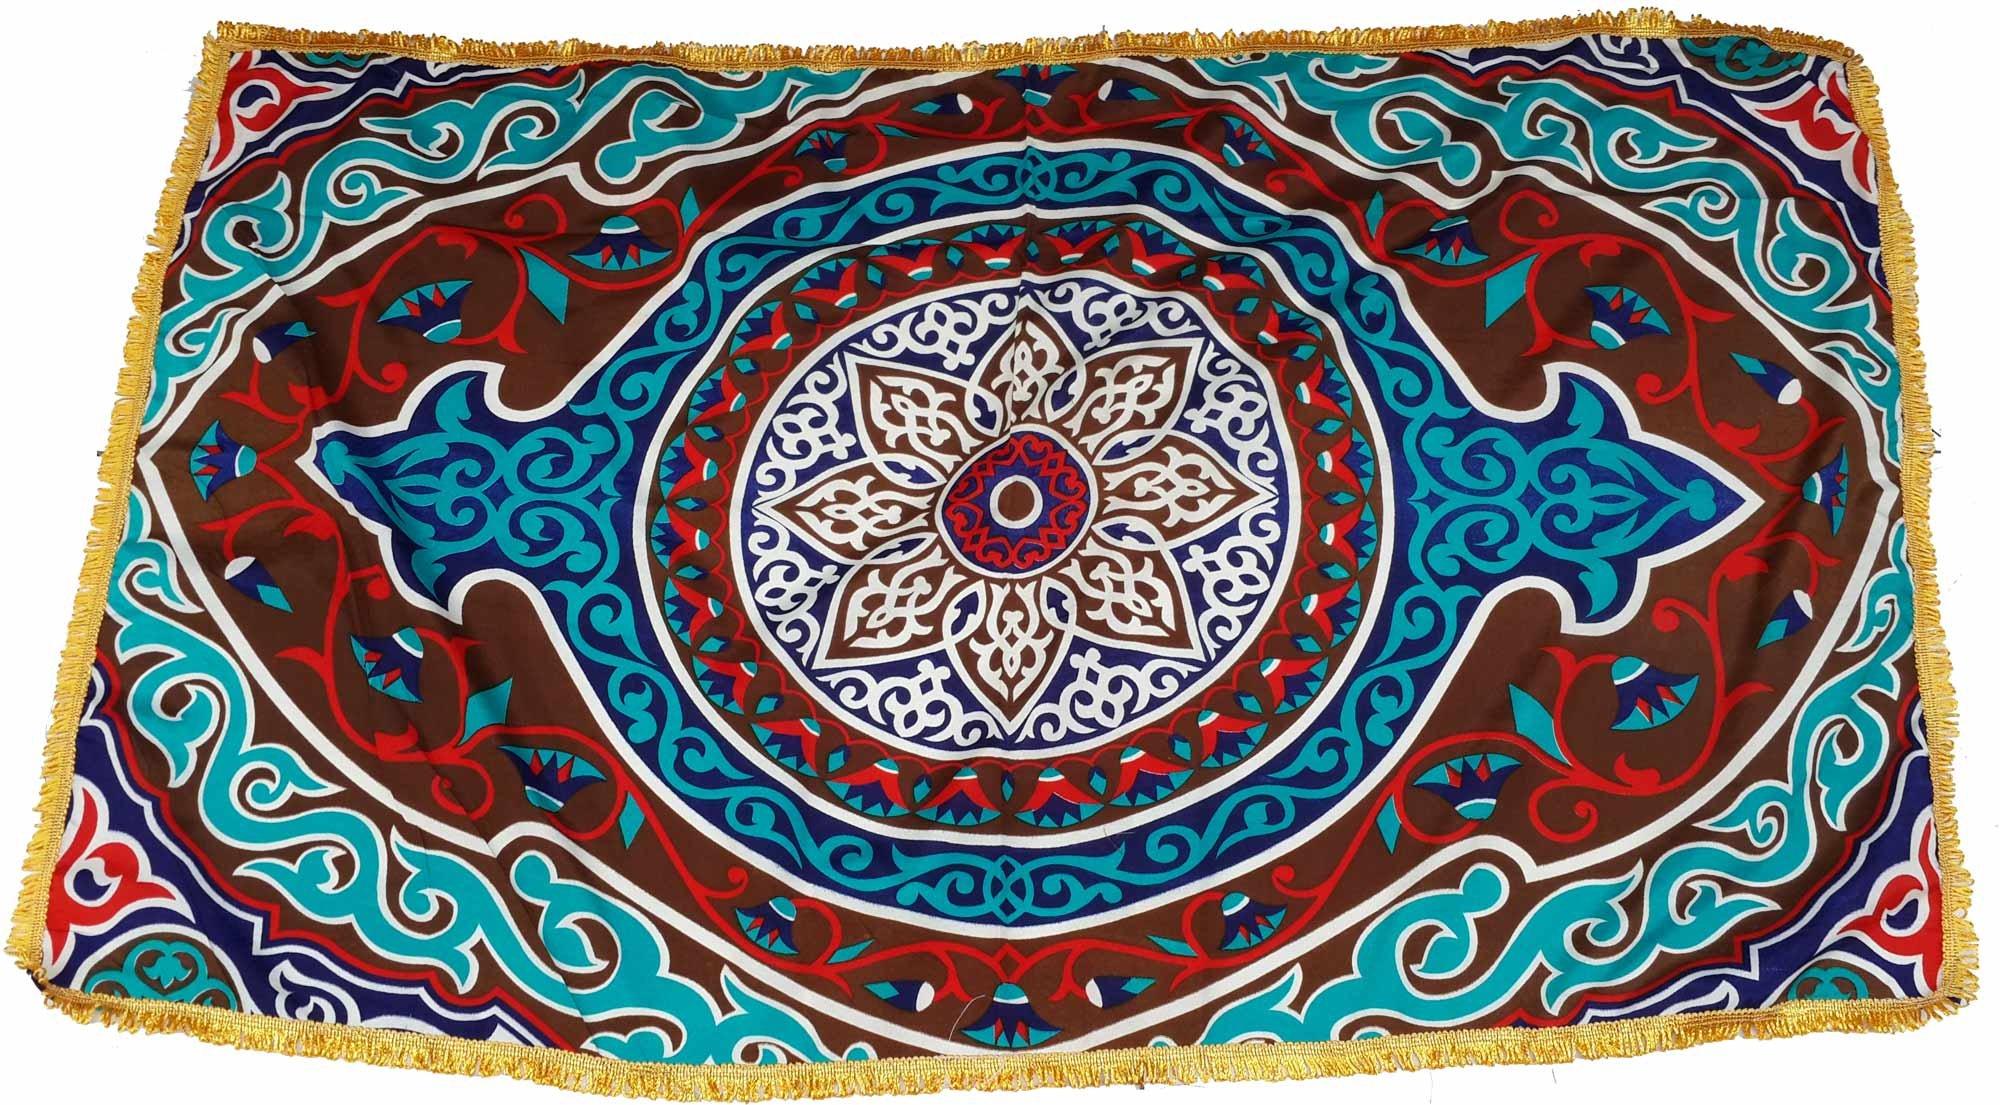 Egypt gift shops Traditional Exotic Classic Egyptian Ethnic Khayamiya Cloth Ramadan Display Showroom Fabric Table Top Wall Decor Party Sofa Chair Cover Fringes